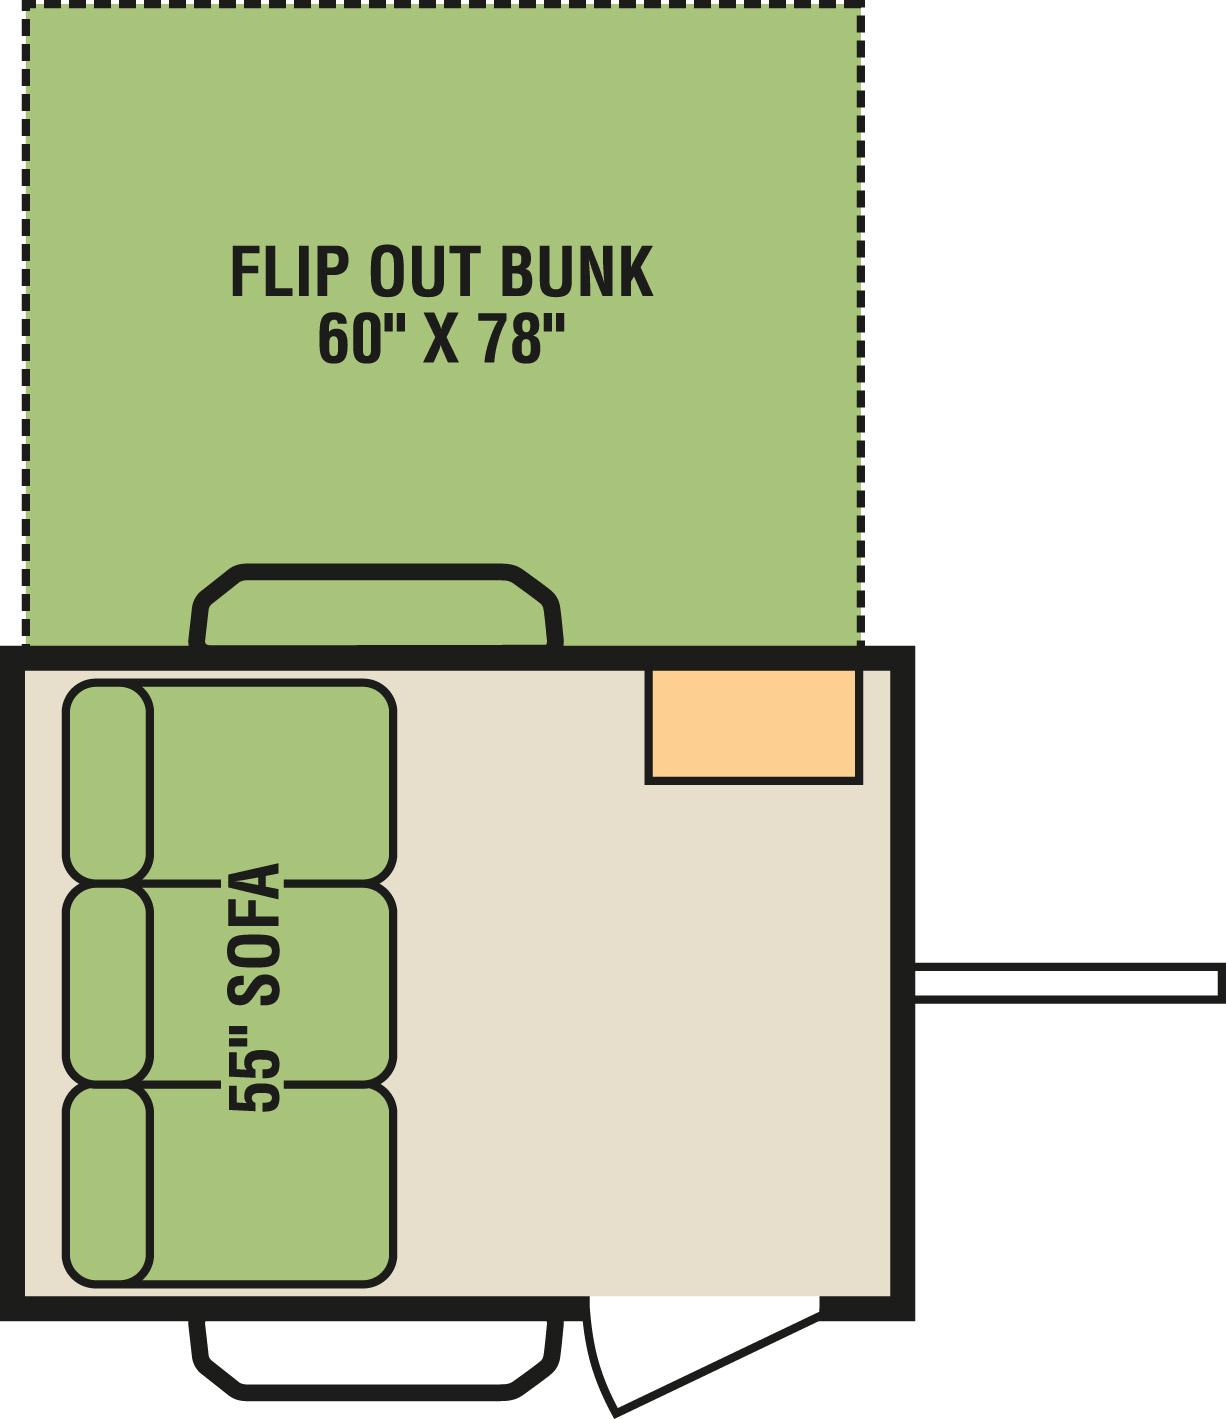 6.0 - Floorplan